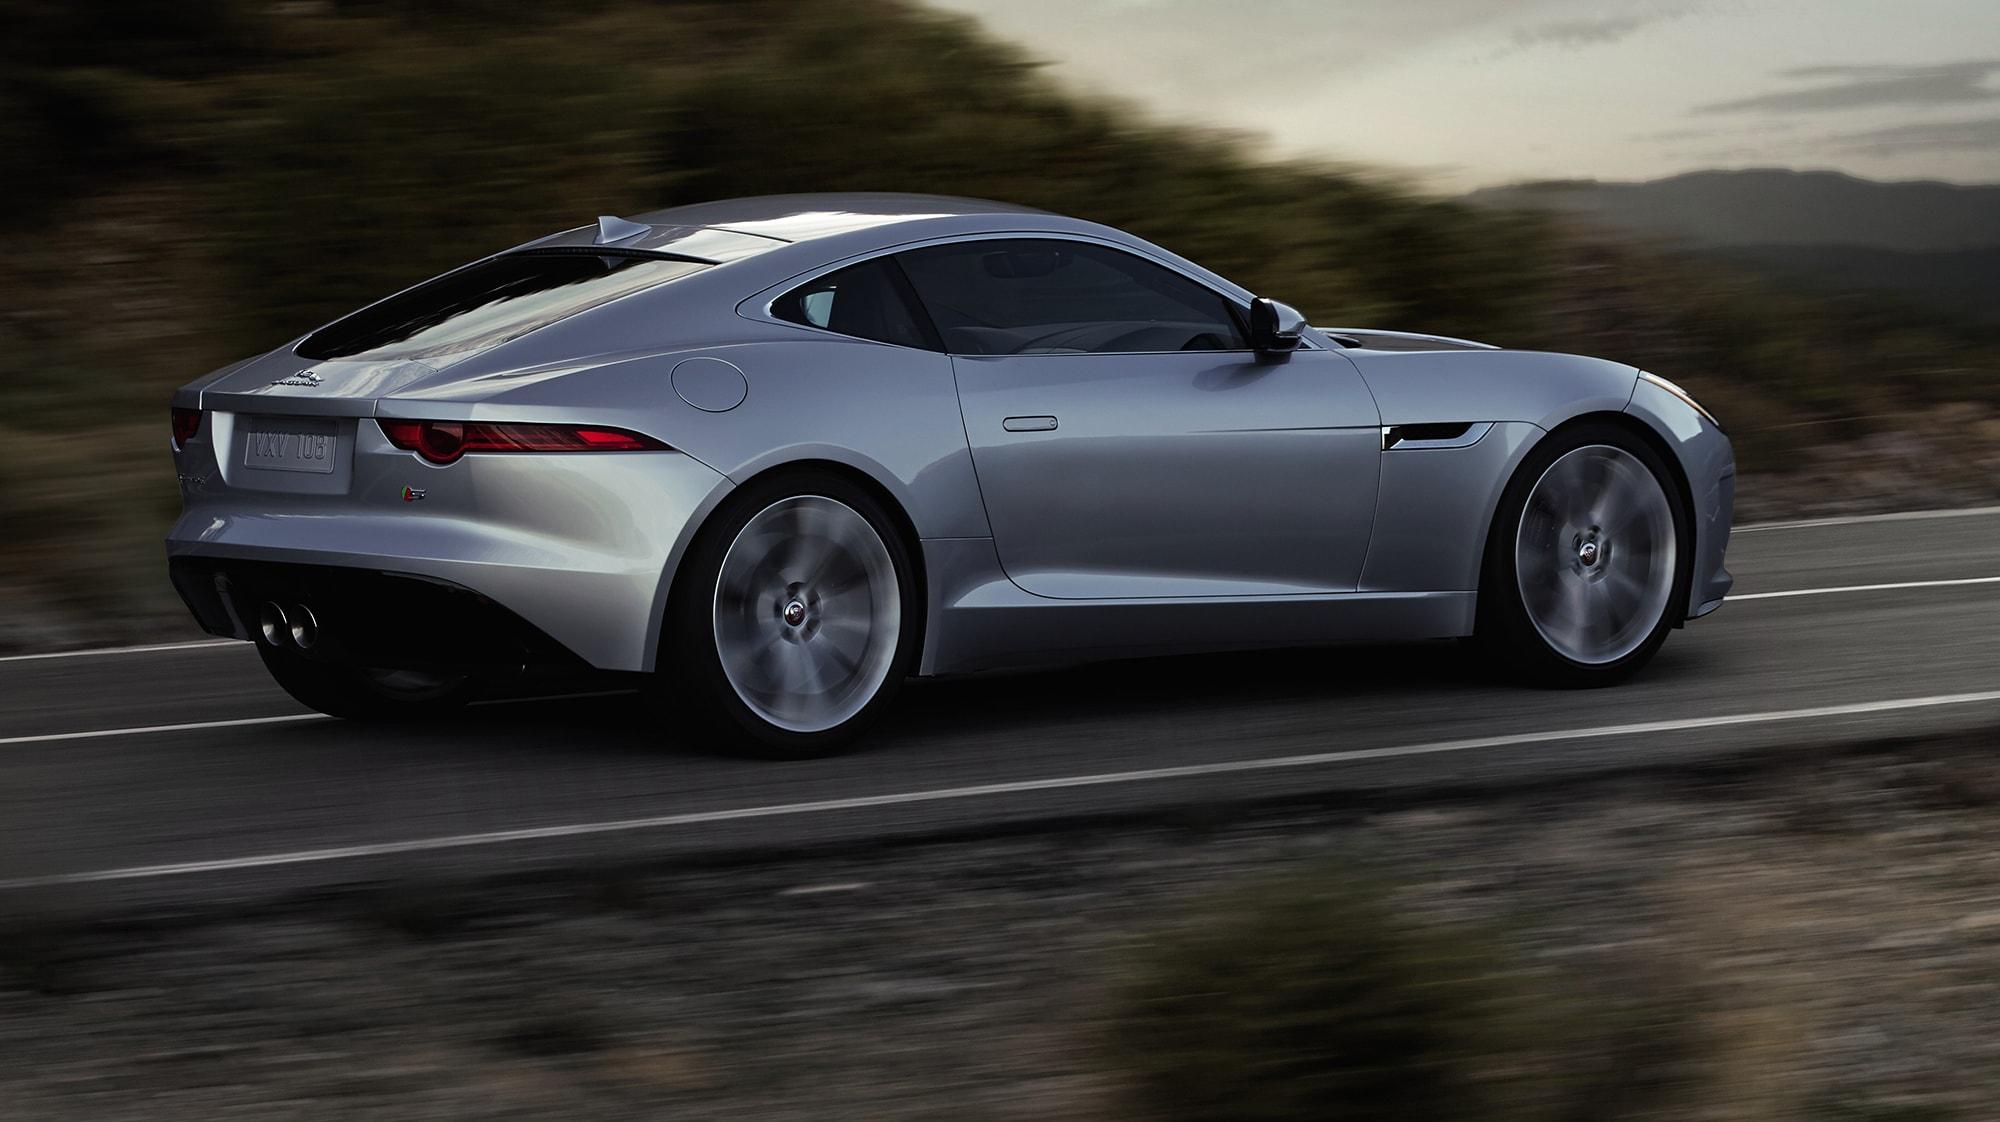 BMW Certified Pre Owned >> Media Gallery of Jaguar F-TYPE | Jaguar F-TYPE Near Boca ...